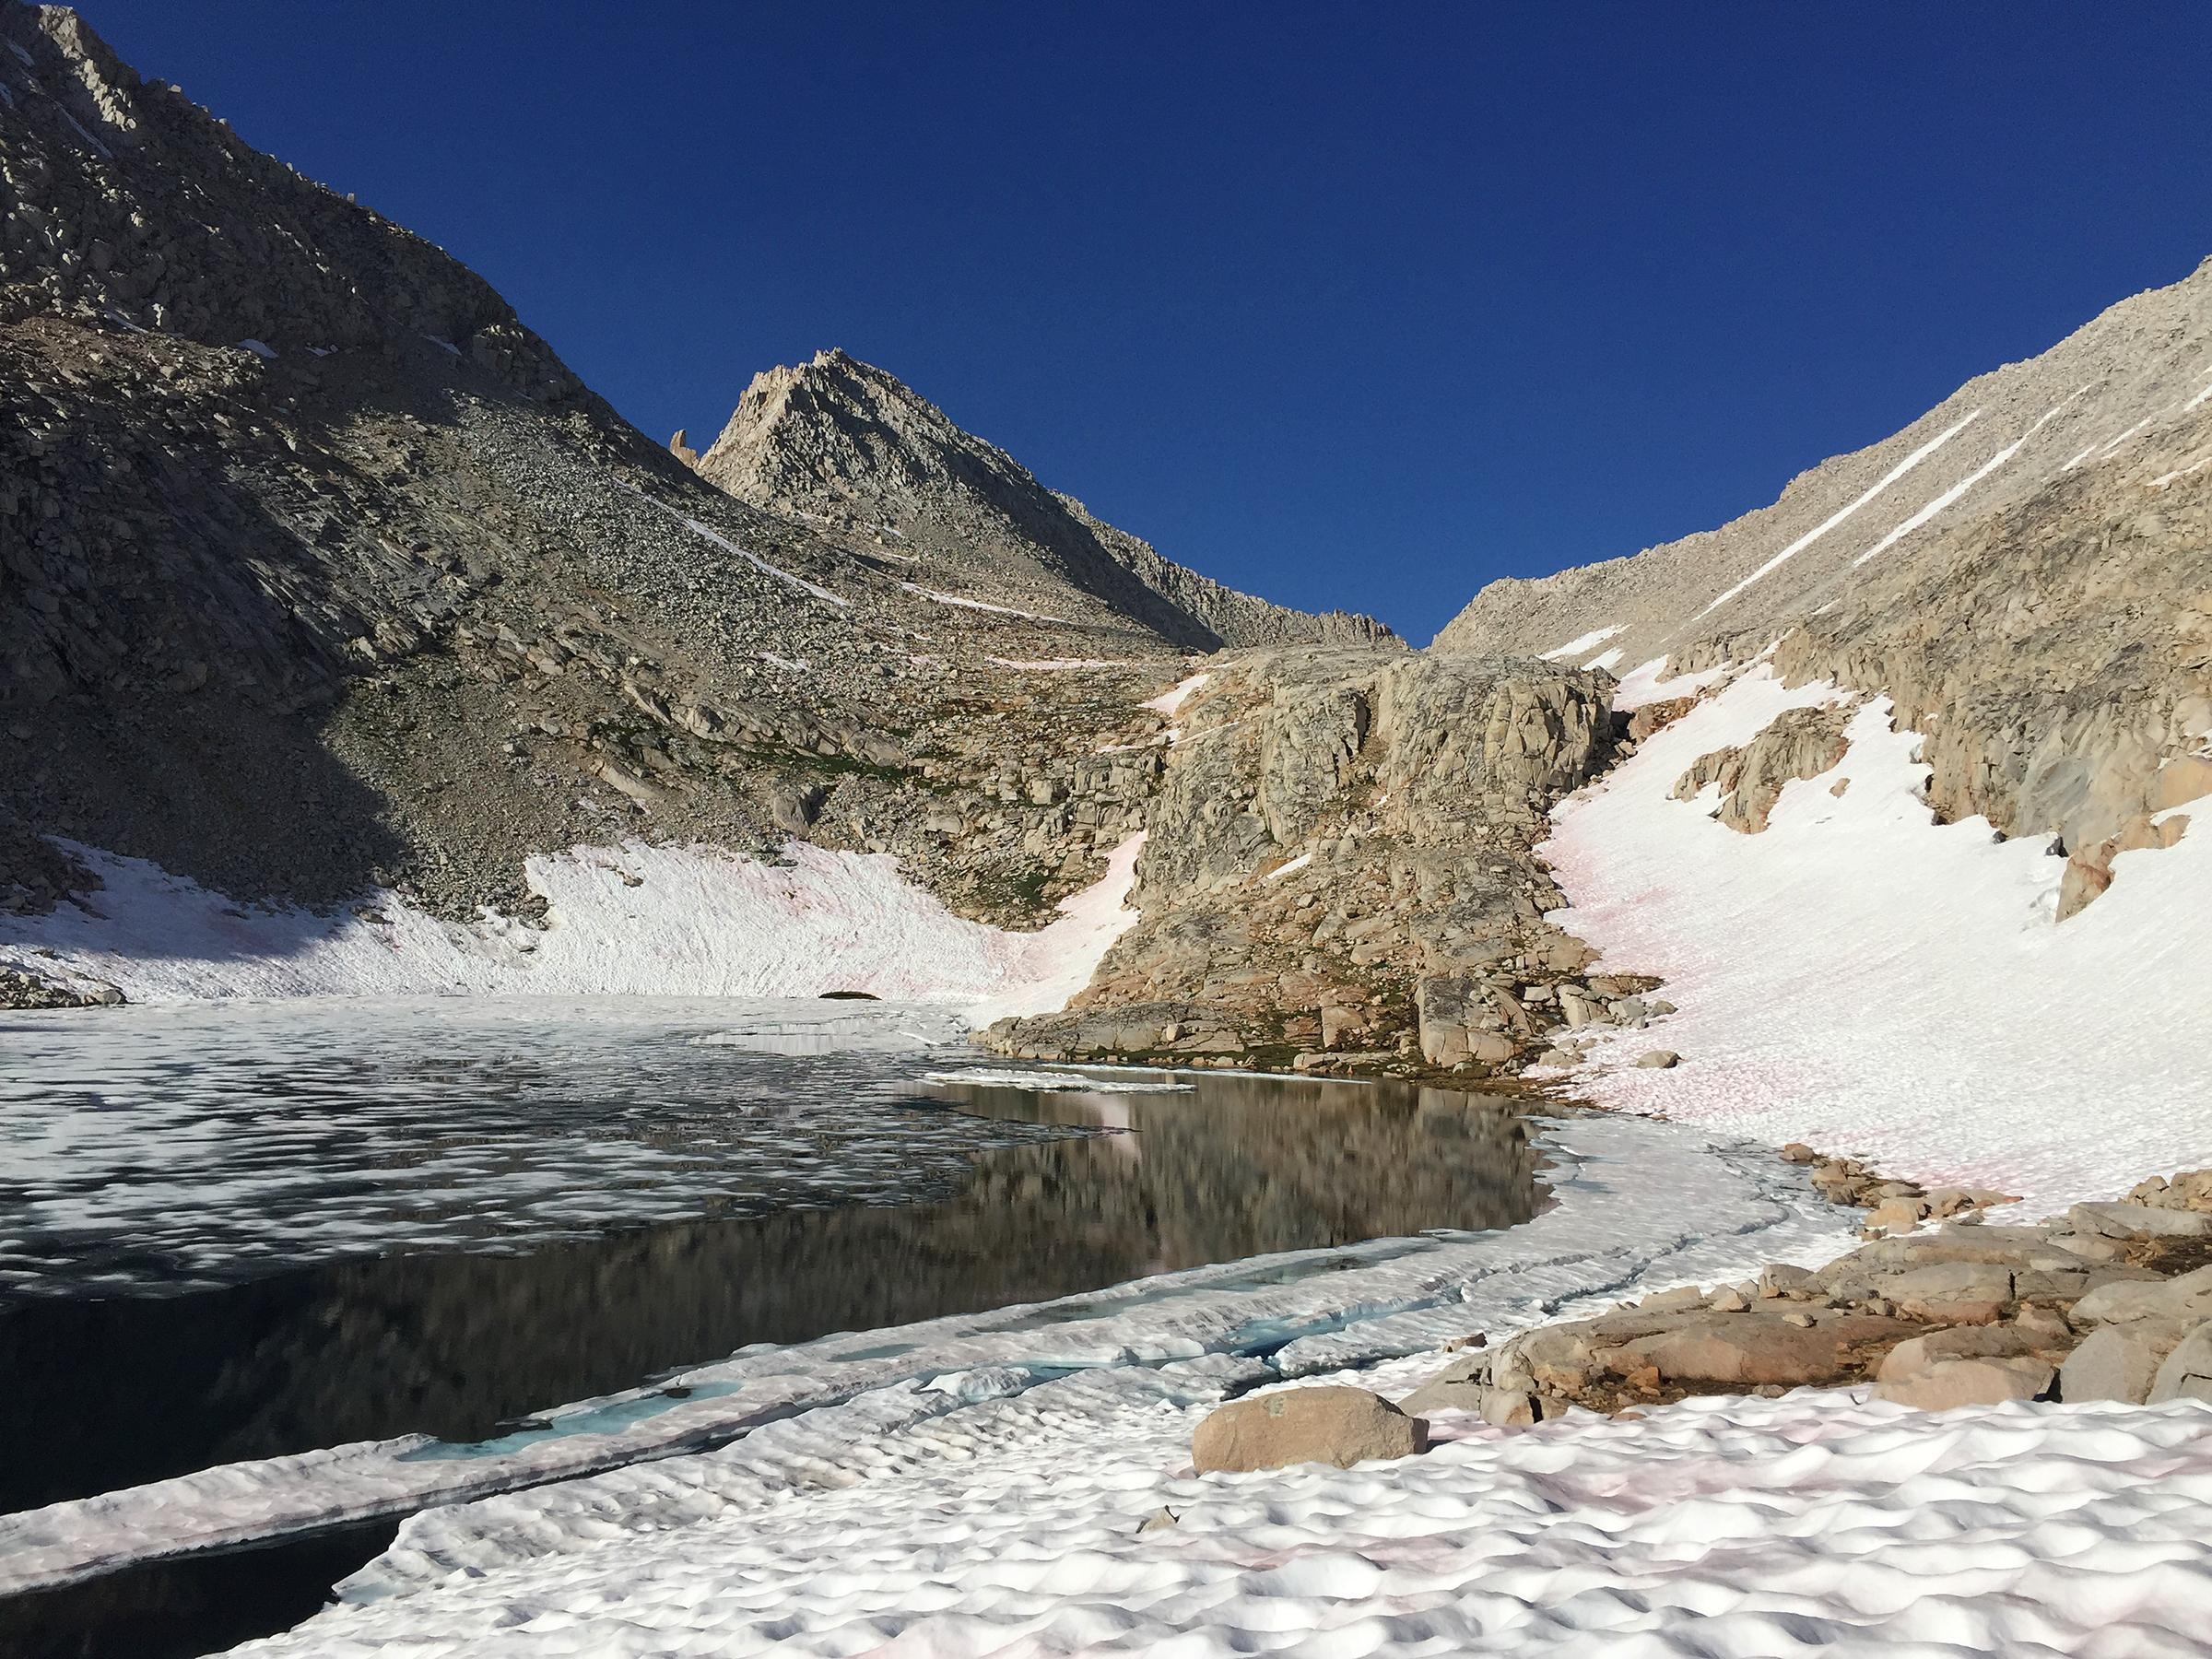 trailname-backstroke-sierra-high-route-2017_0689.jpg